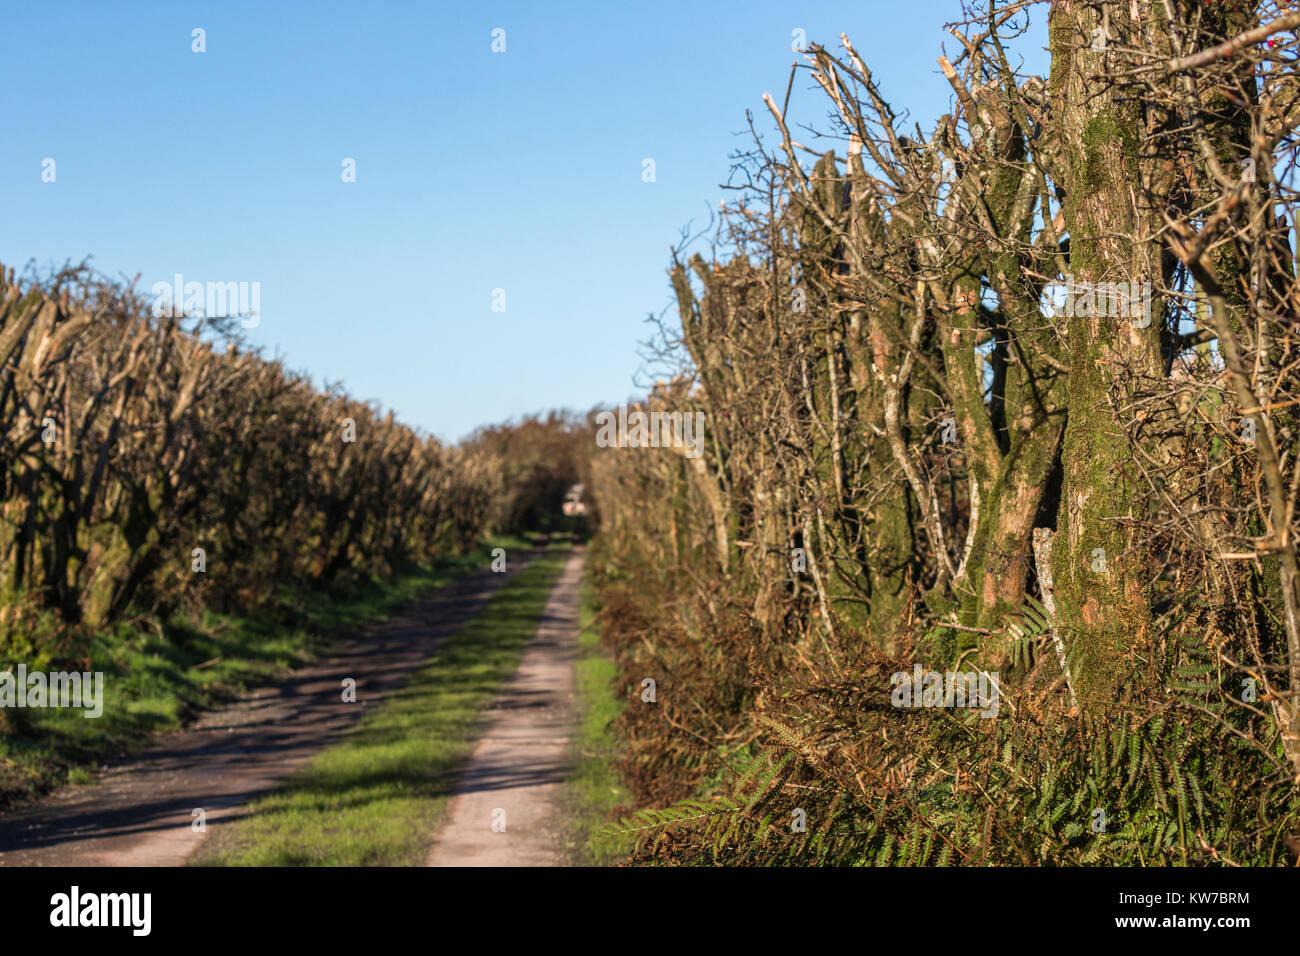 Hawthorn (Crataegus monogyna) cut to maintain as hedge, Caerlaverock Wildfowl and Wetland Trust reserve, Dumfries - Stock Image